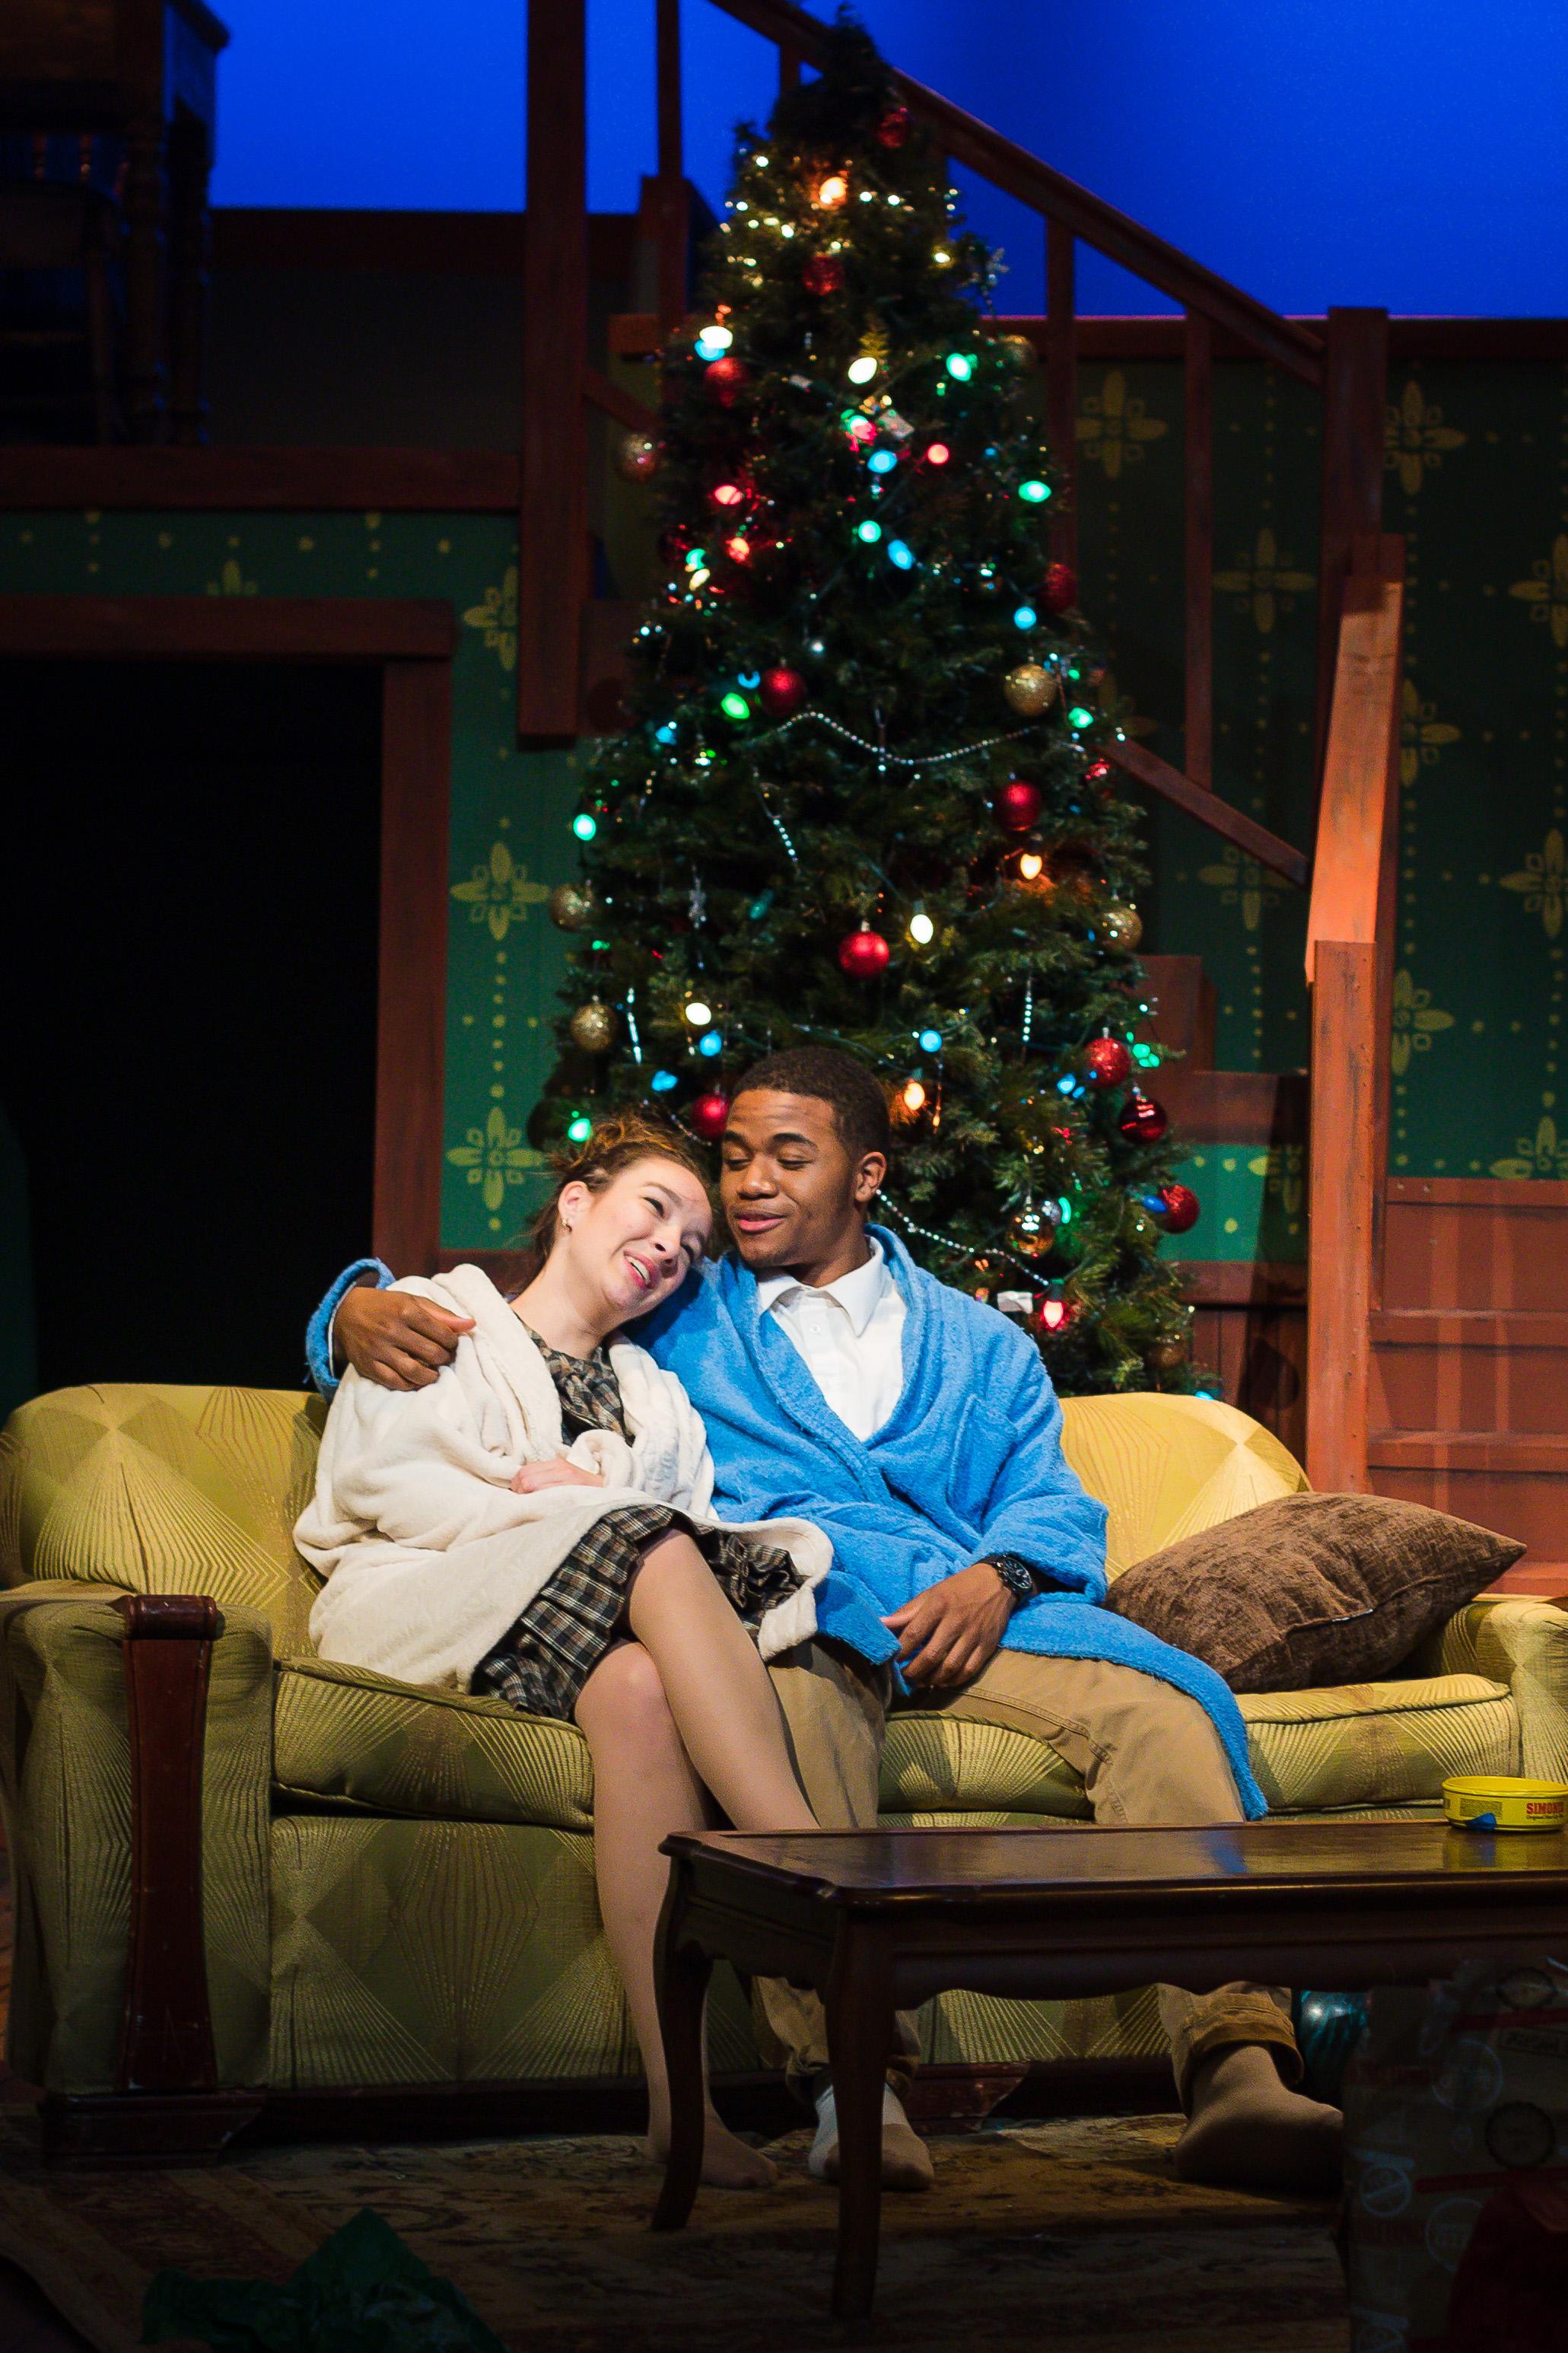 Weaver_Christmasshoot-_MG_1658